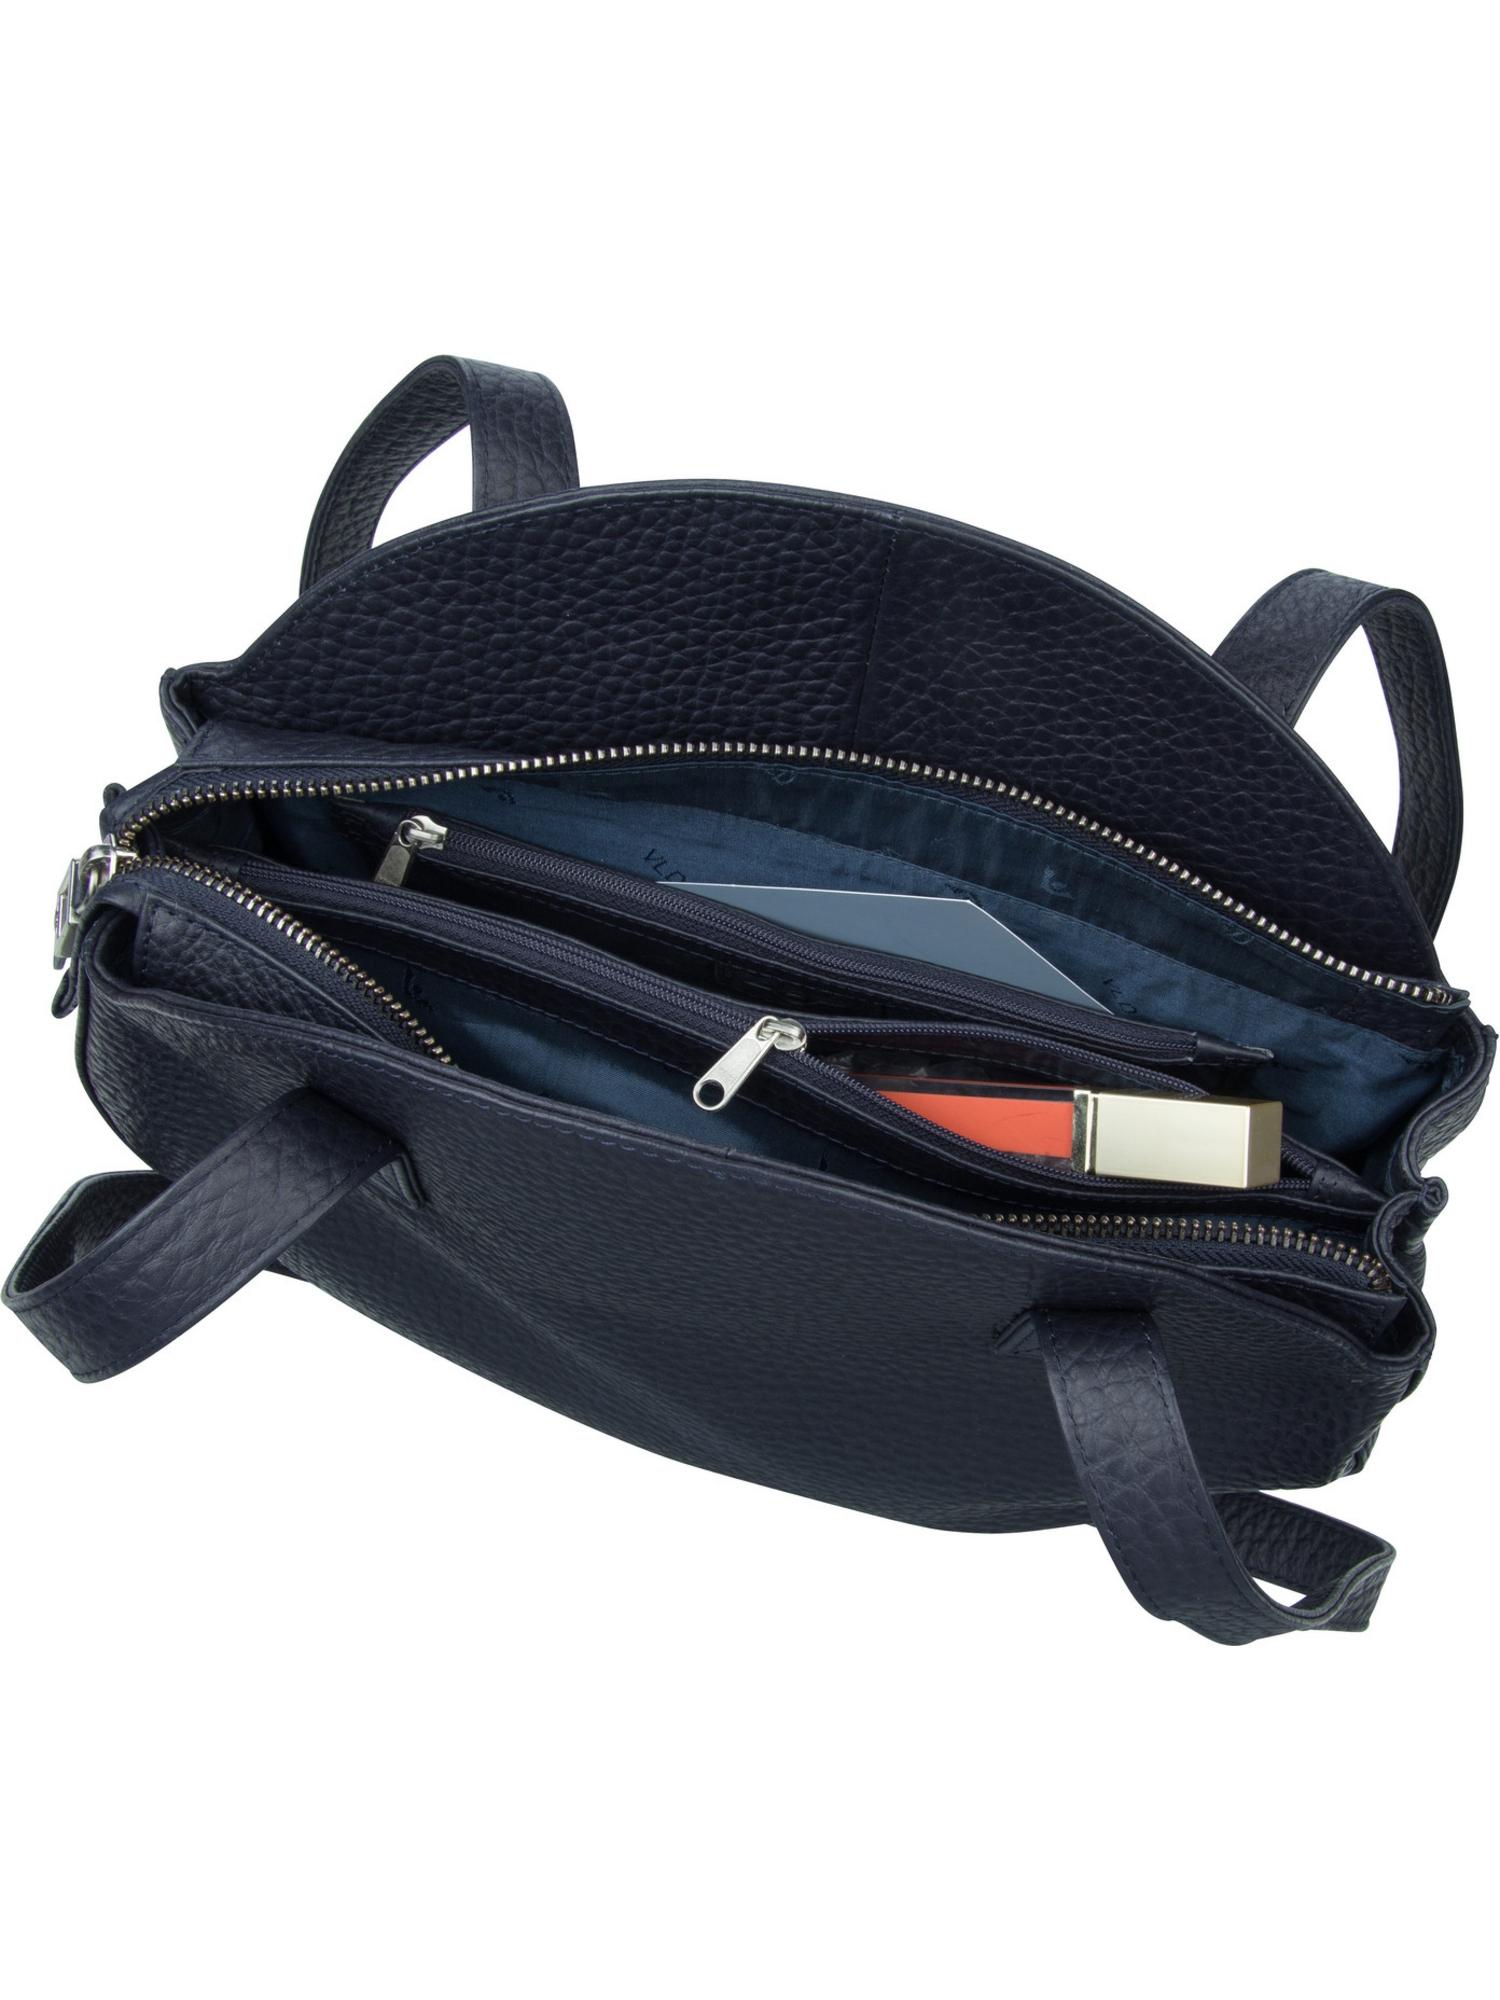 Voi: Hirsch 21954 Hobo Bag